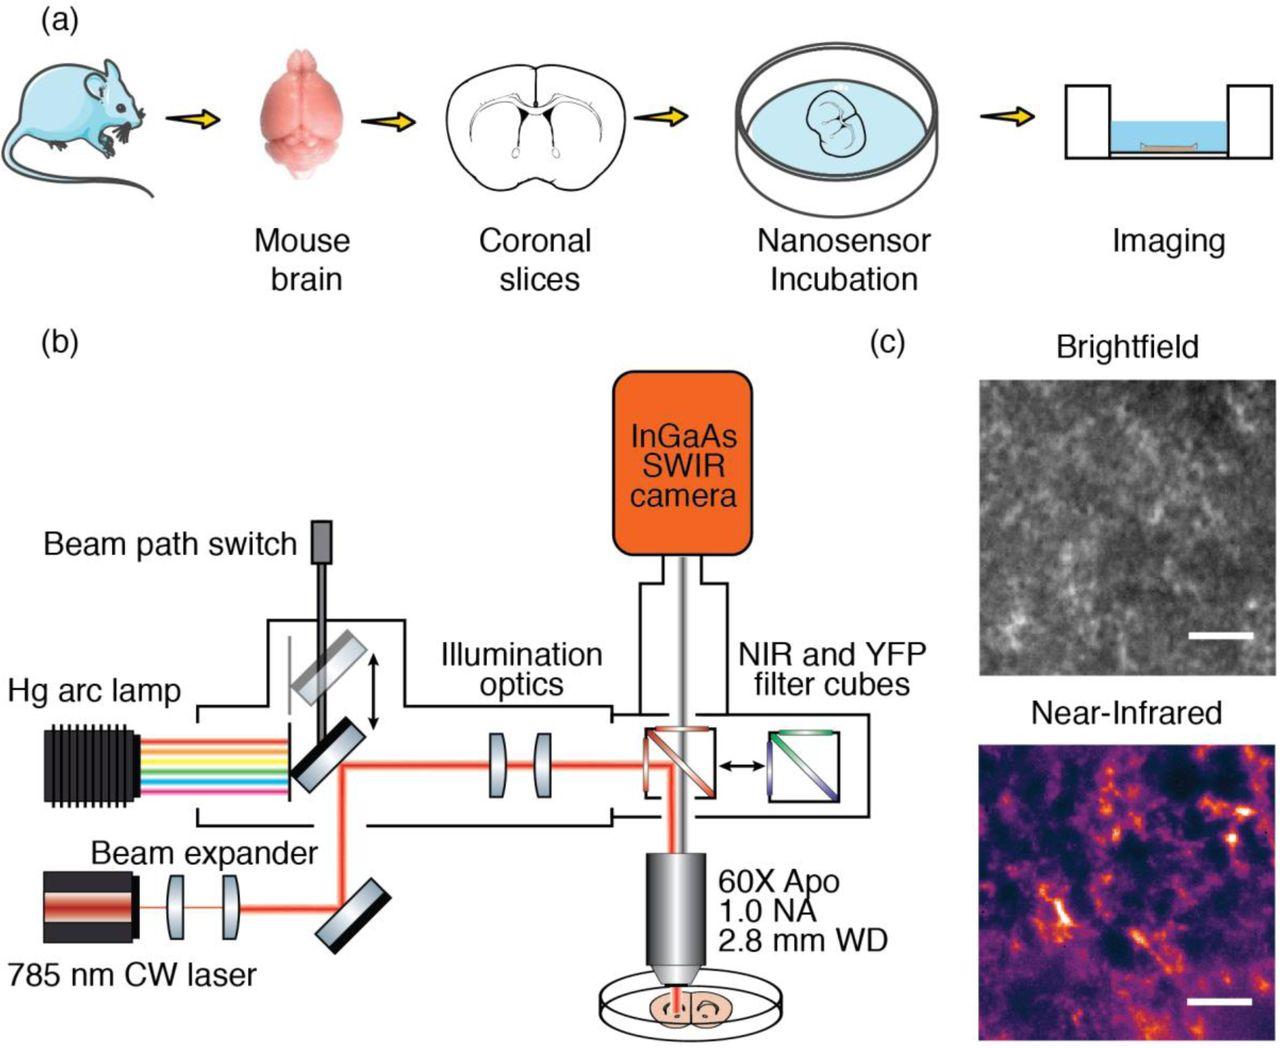 hight resolution of imaging striatal dopamine release using a non genetically encoded near infrared fluorescent catecholamine nanosensor biorxiv